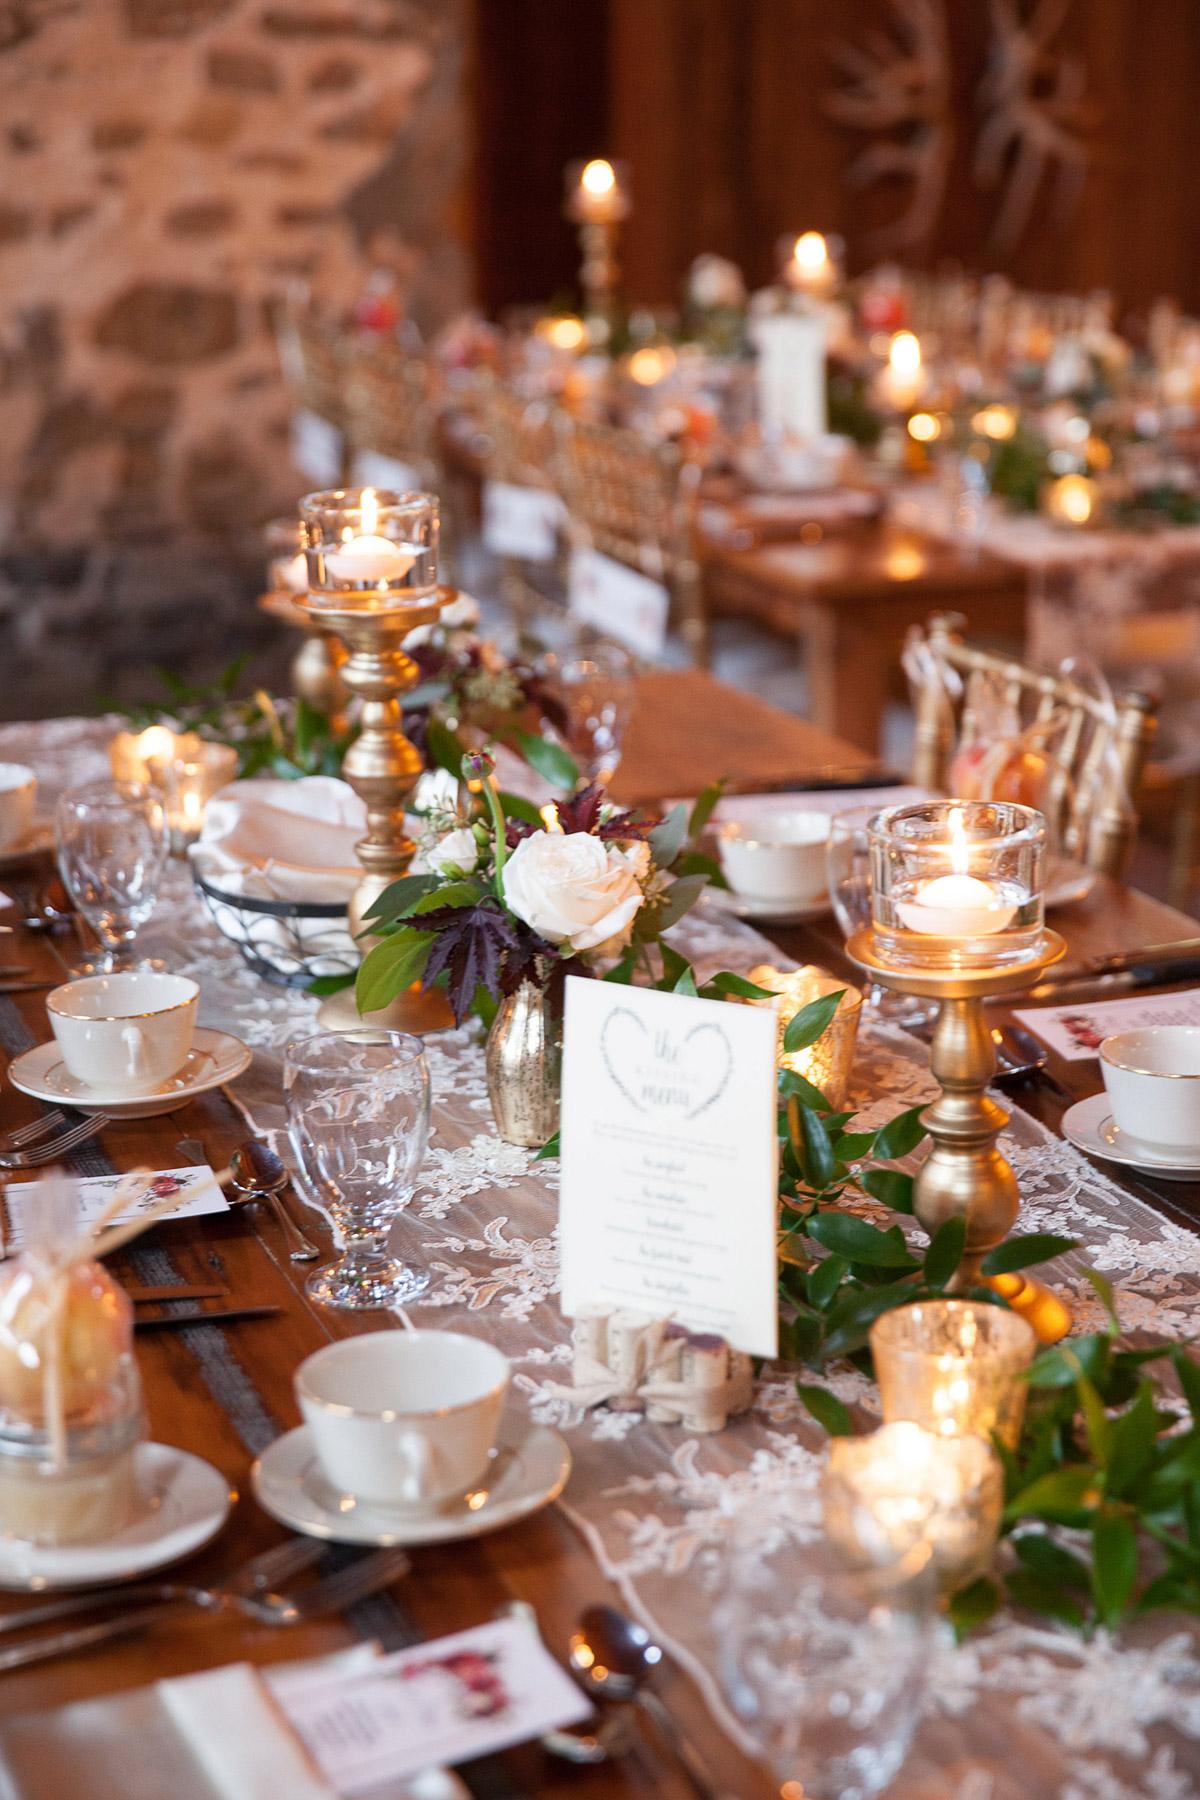 gemini-photography-vineyard-bride-swish-list-honsberger-estates-jordan-wedding-8.jpg